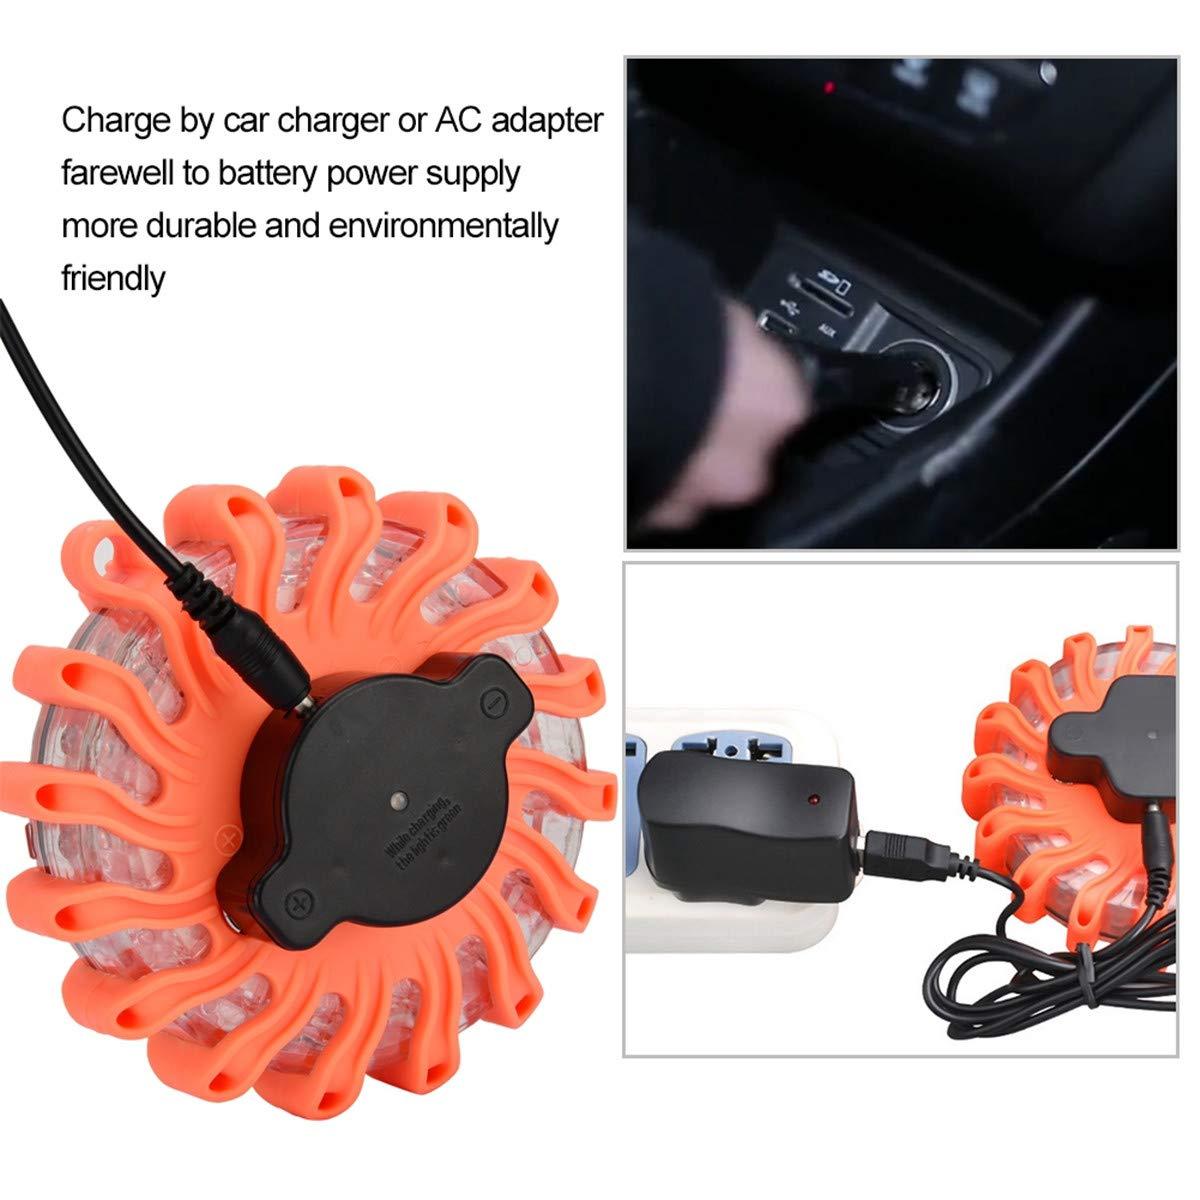 Amber Rechargeable LED Road Flare 1 Pack LED Roadside Warning Light Flashing Safety Emergency Light 100-240V Plug